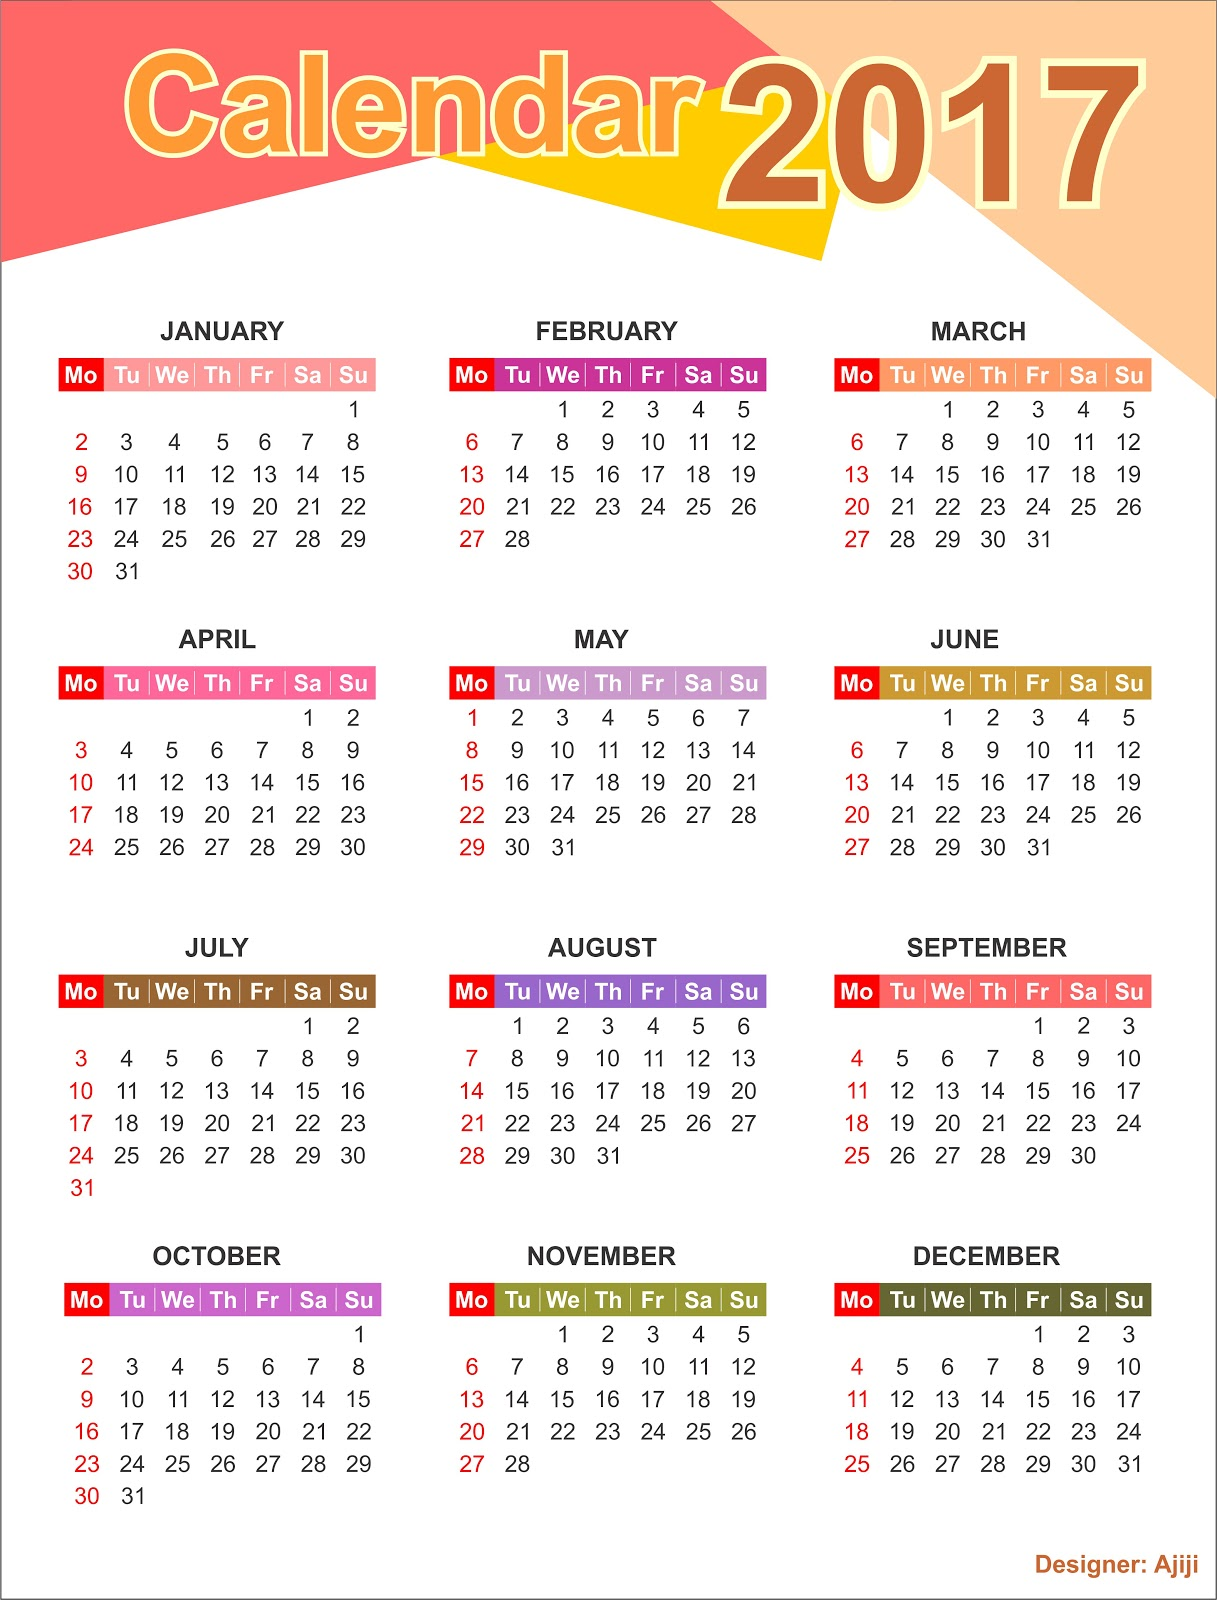 2017 Calendar - Download 17 free printable Excel …